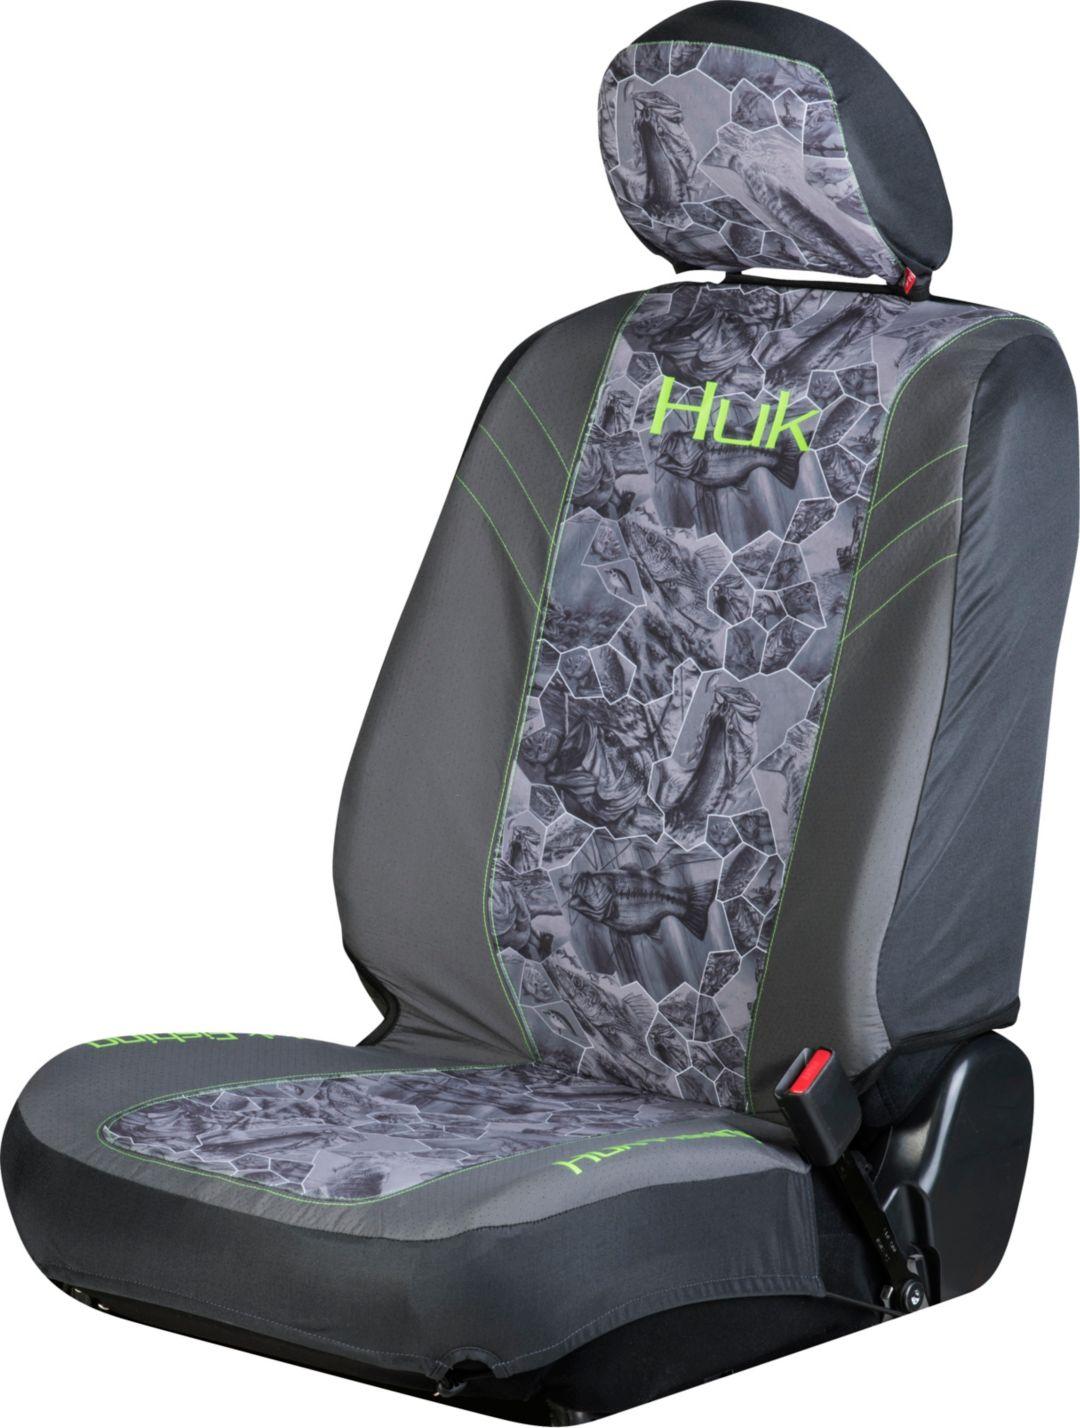 Fabulous Huk Lowback Seat Cover Uwap Interior Chair Design Uwaporg